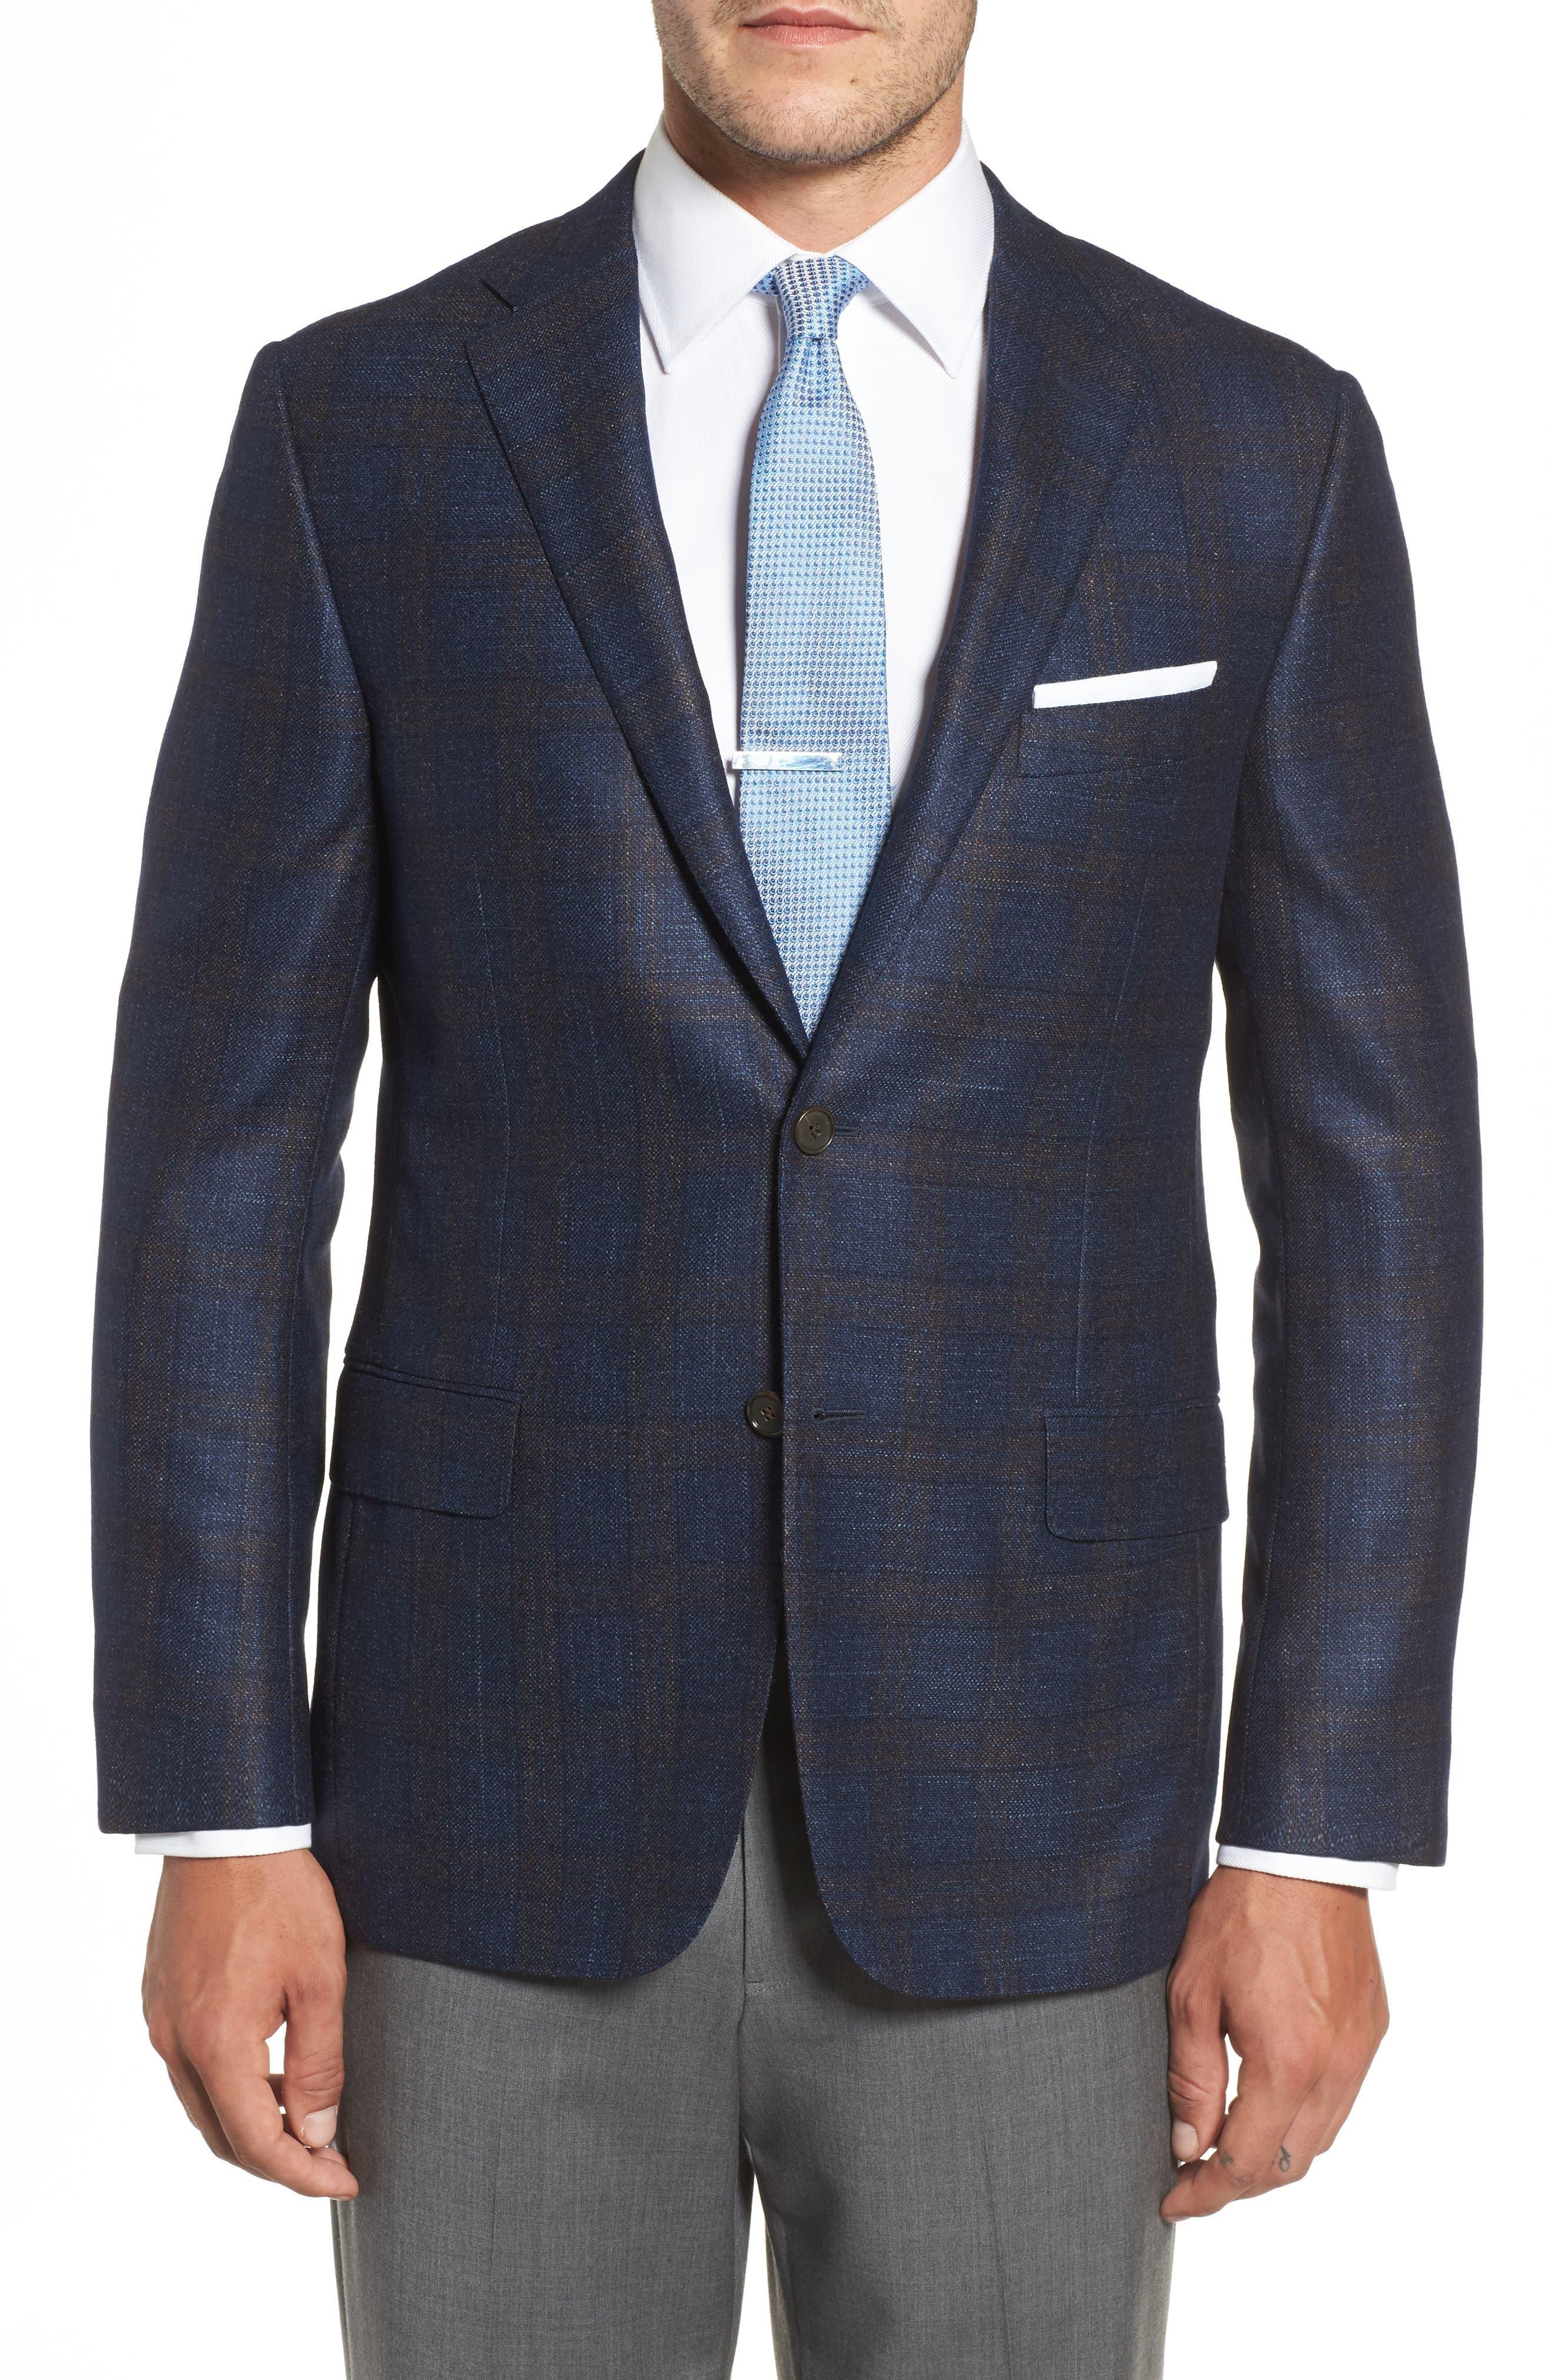 Alternate Image 1 Selected - Hickey Freeman Classic B Fit Plaid Wool Blend Sport Coat